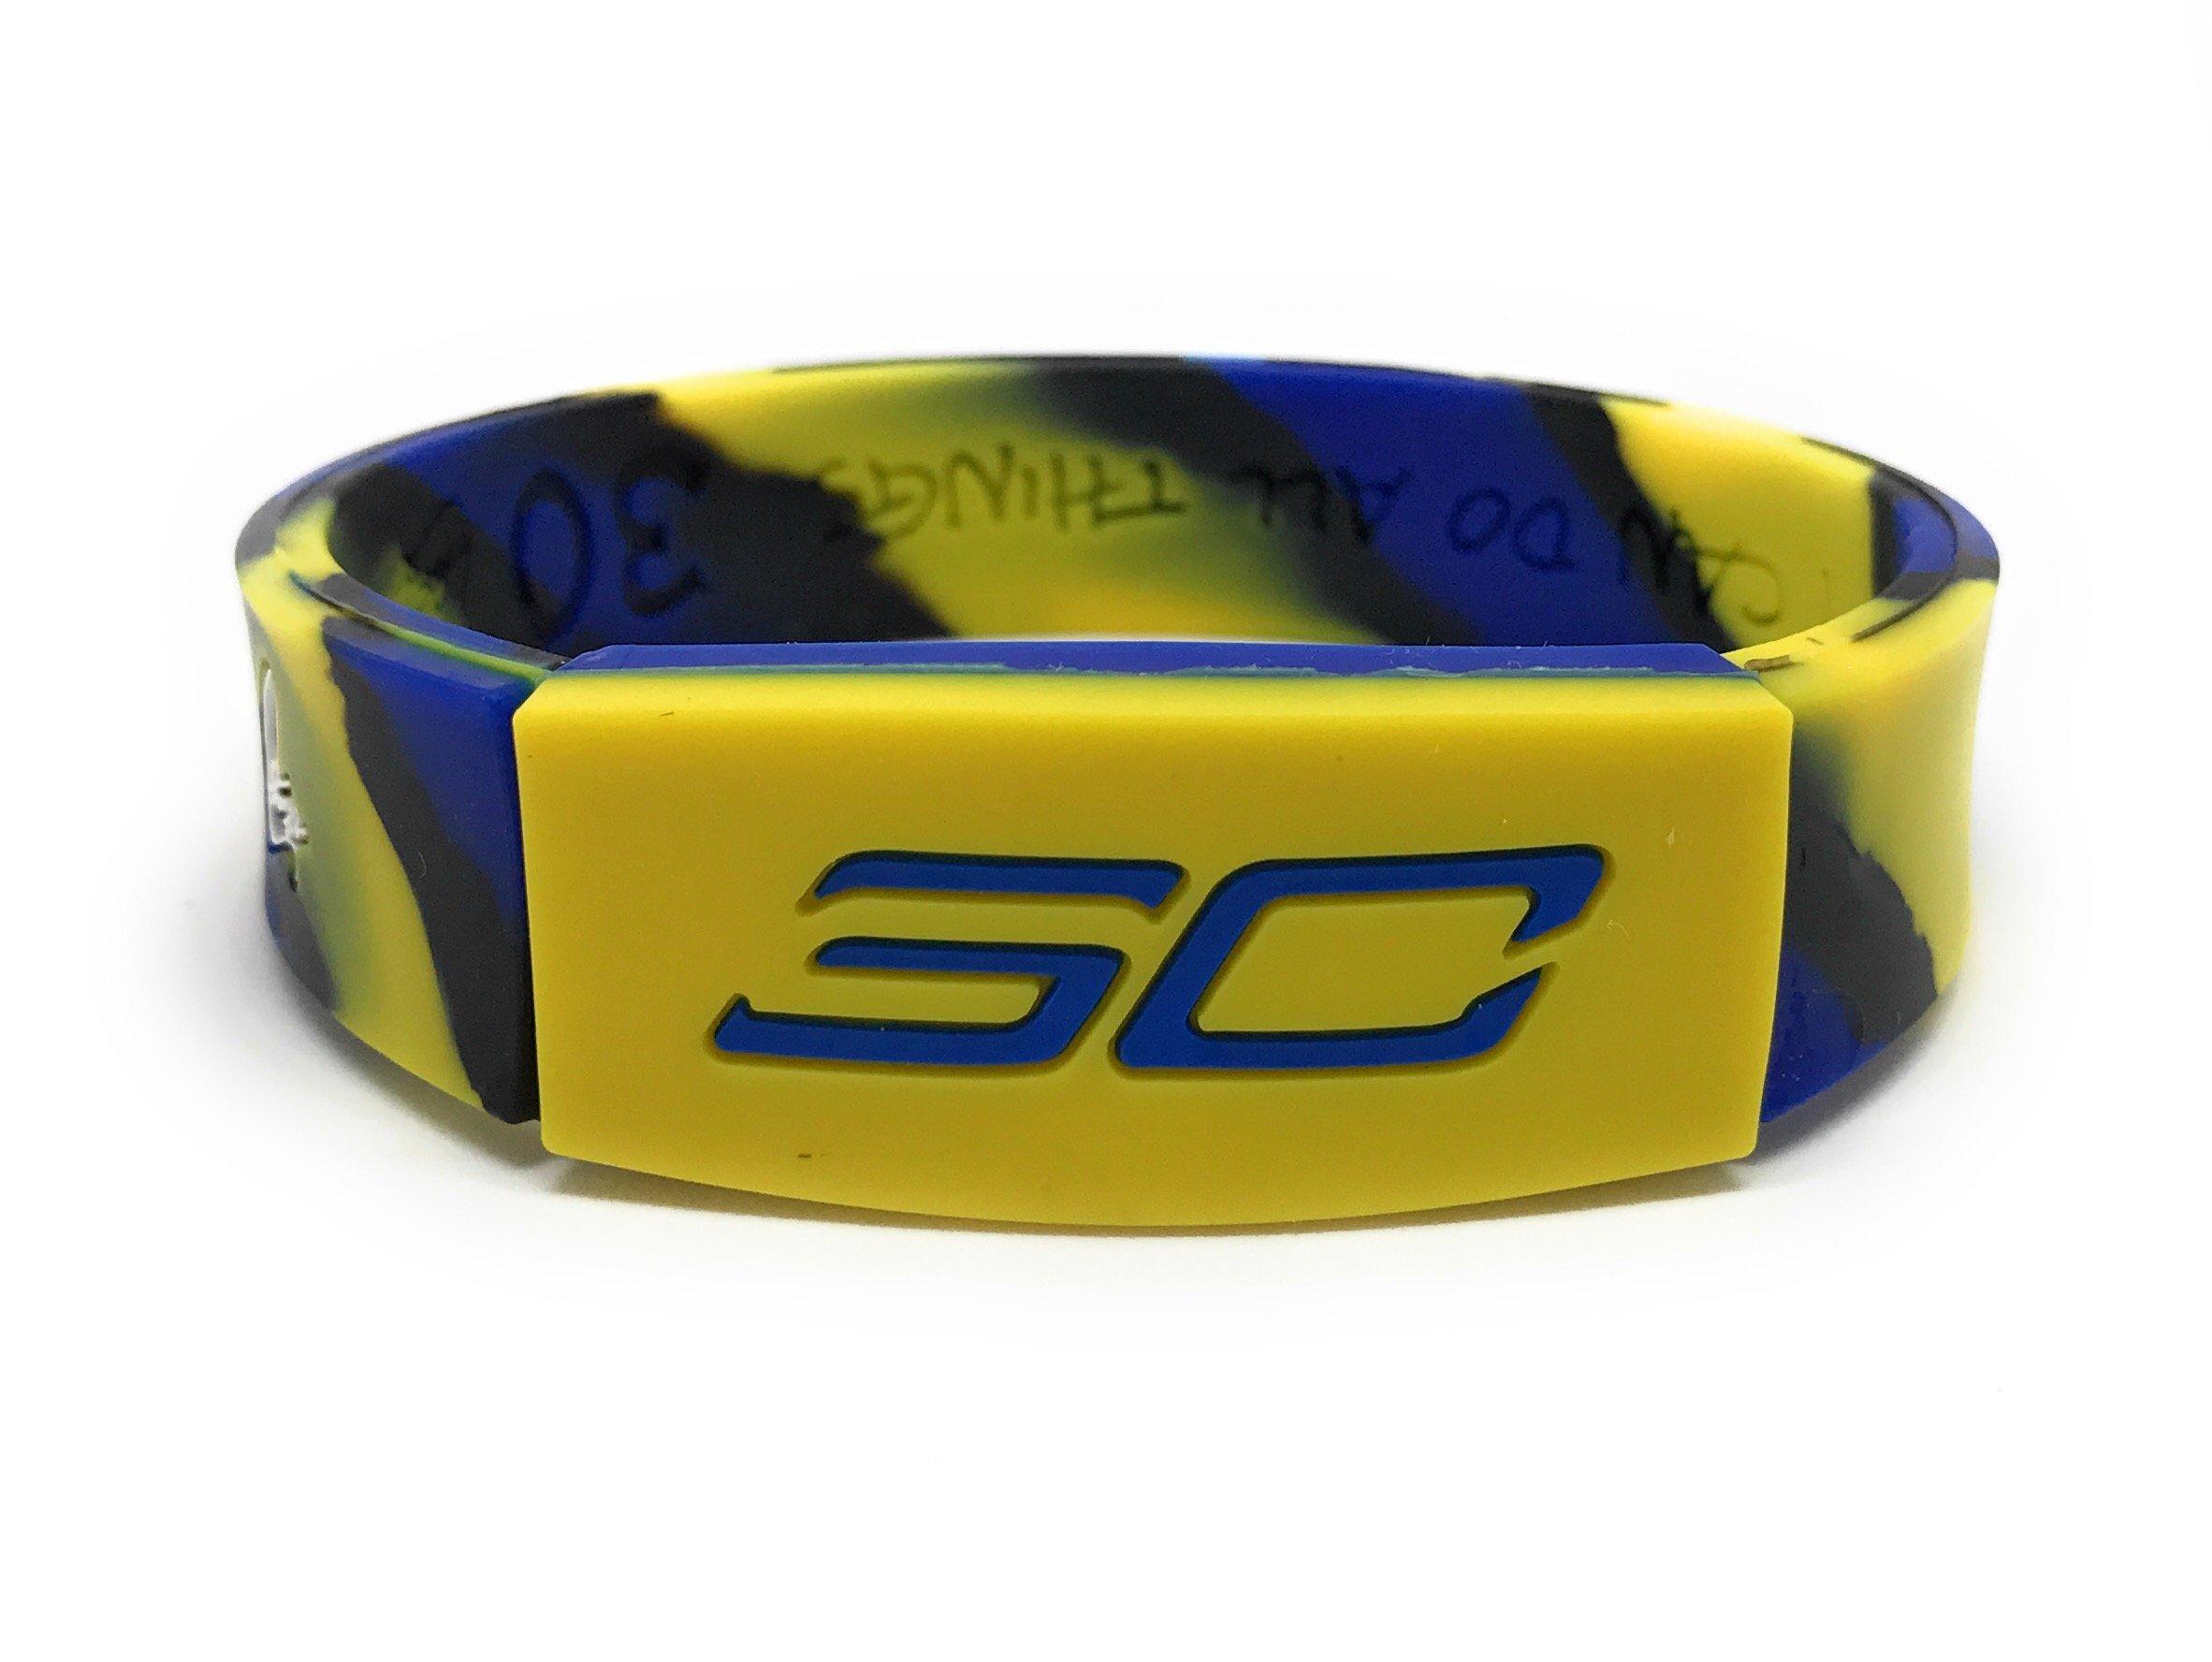 SportsBraceletsPro REVERSIBLE Wristband ADULT/TEEN 7.7'' Size Bracelet (Curry 7.7'' Camo)